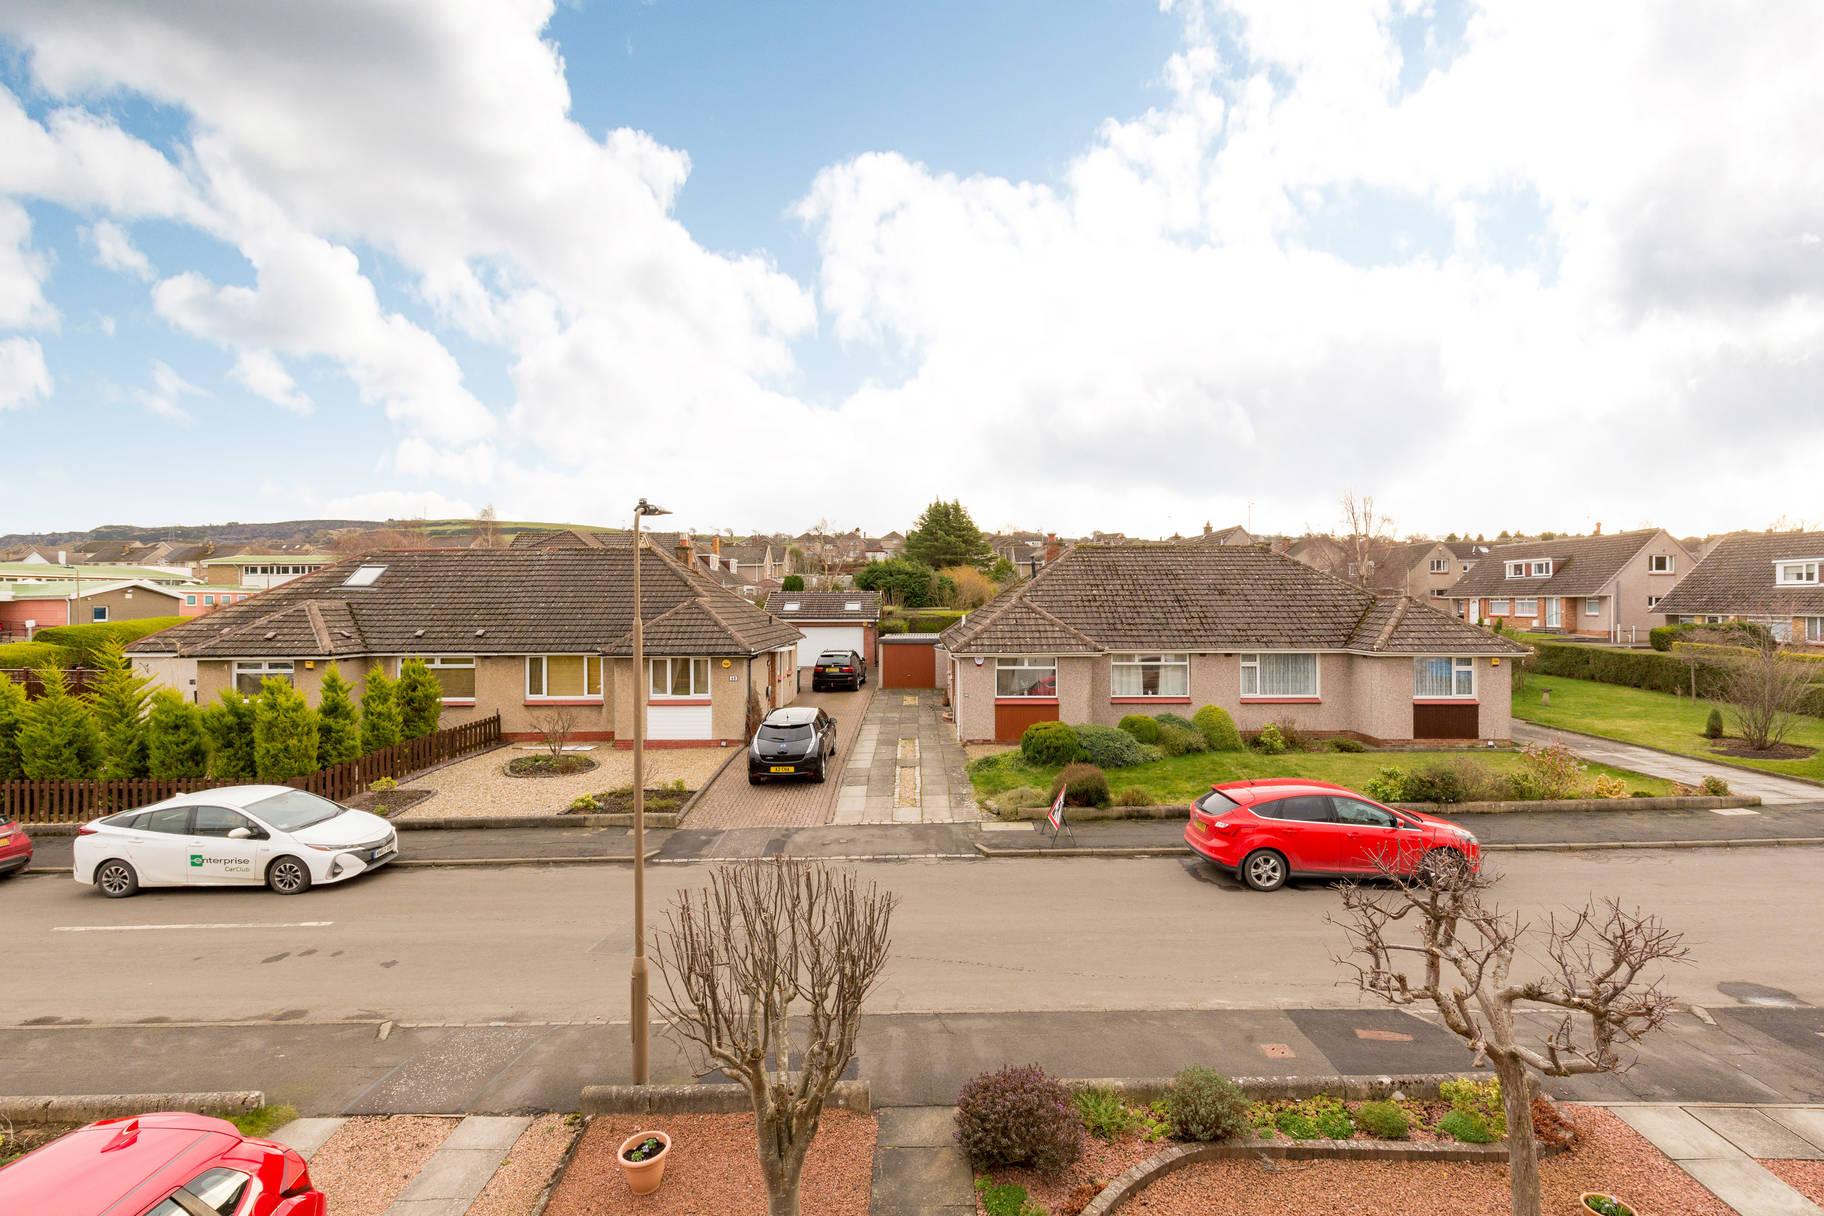 47 Corslet Crescent, Currie, Edinburgh, EH14 5HR